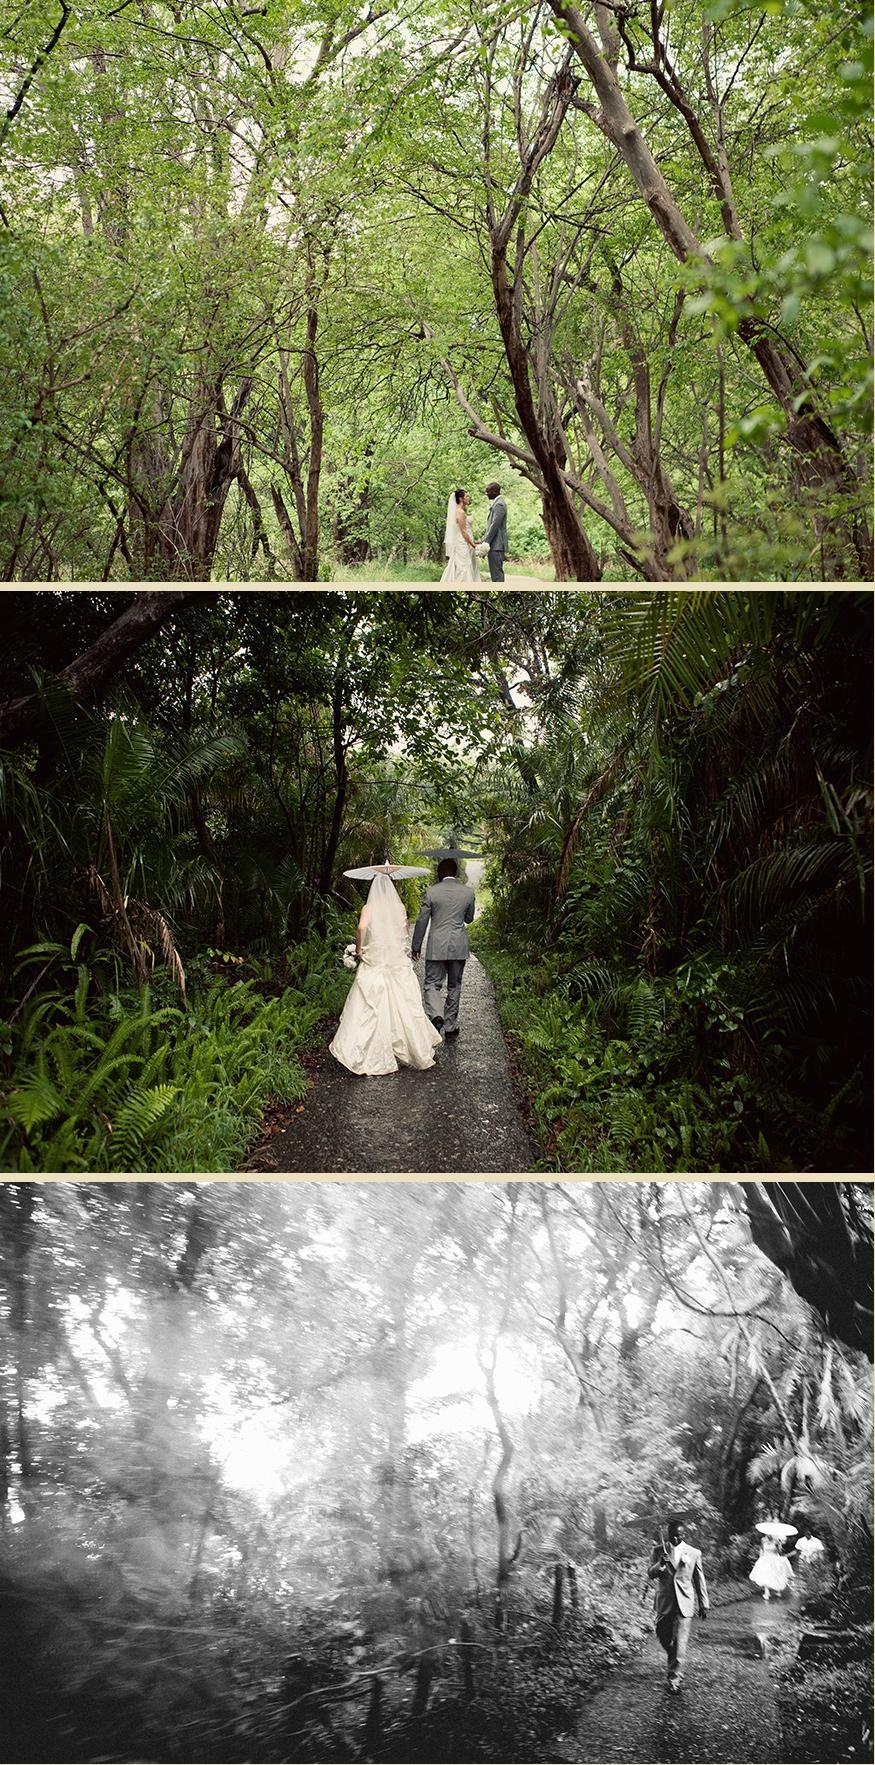 Brisbane Wedding Phoographer Blog-collage-1329188081026